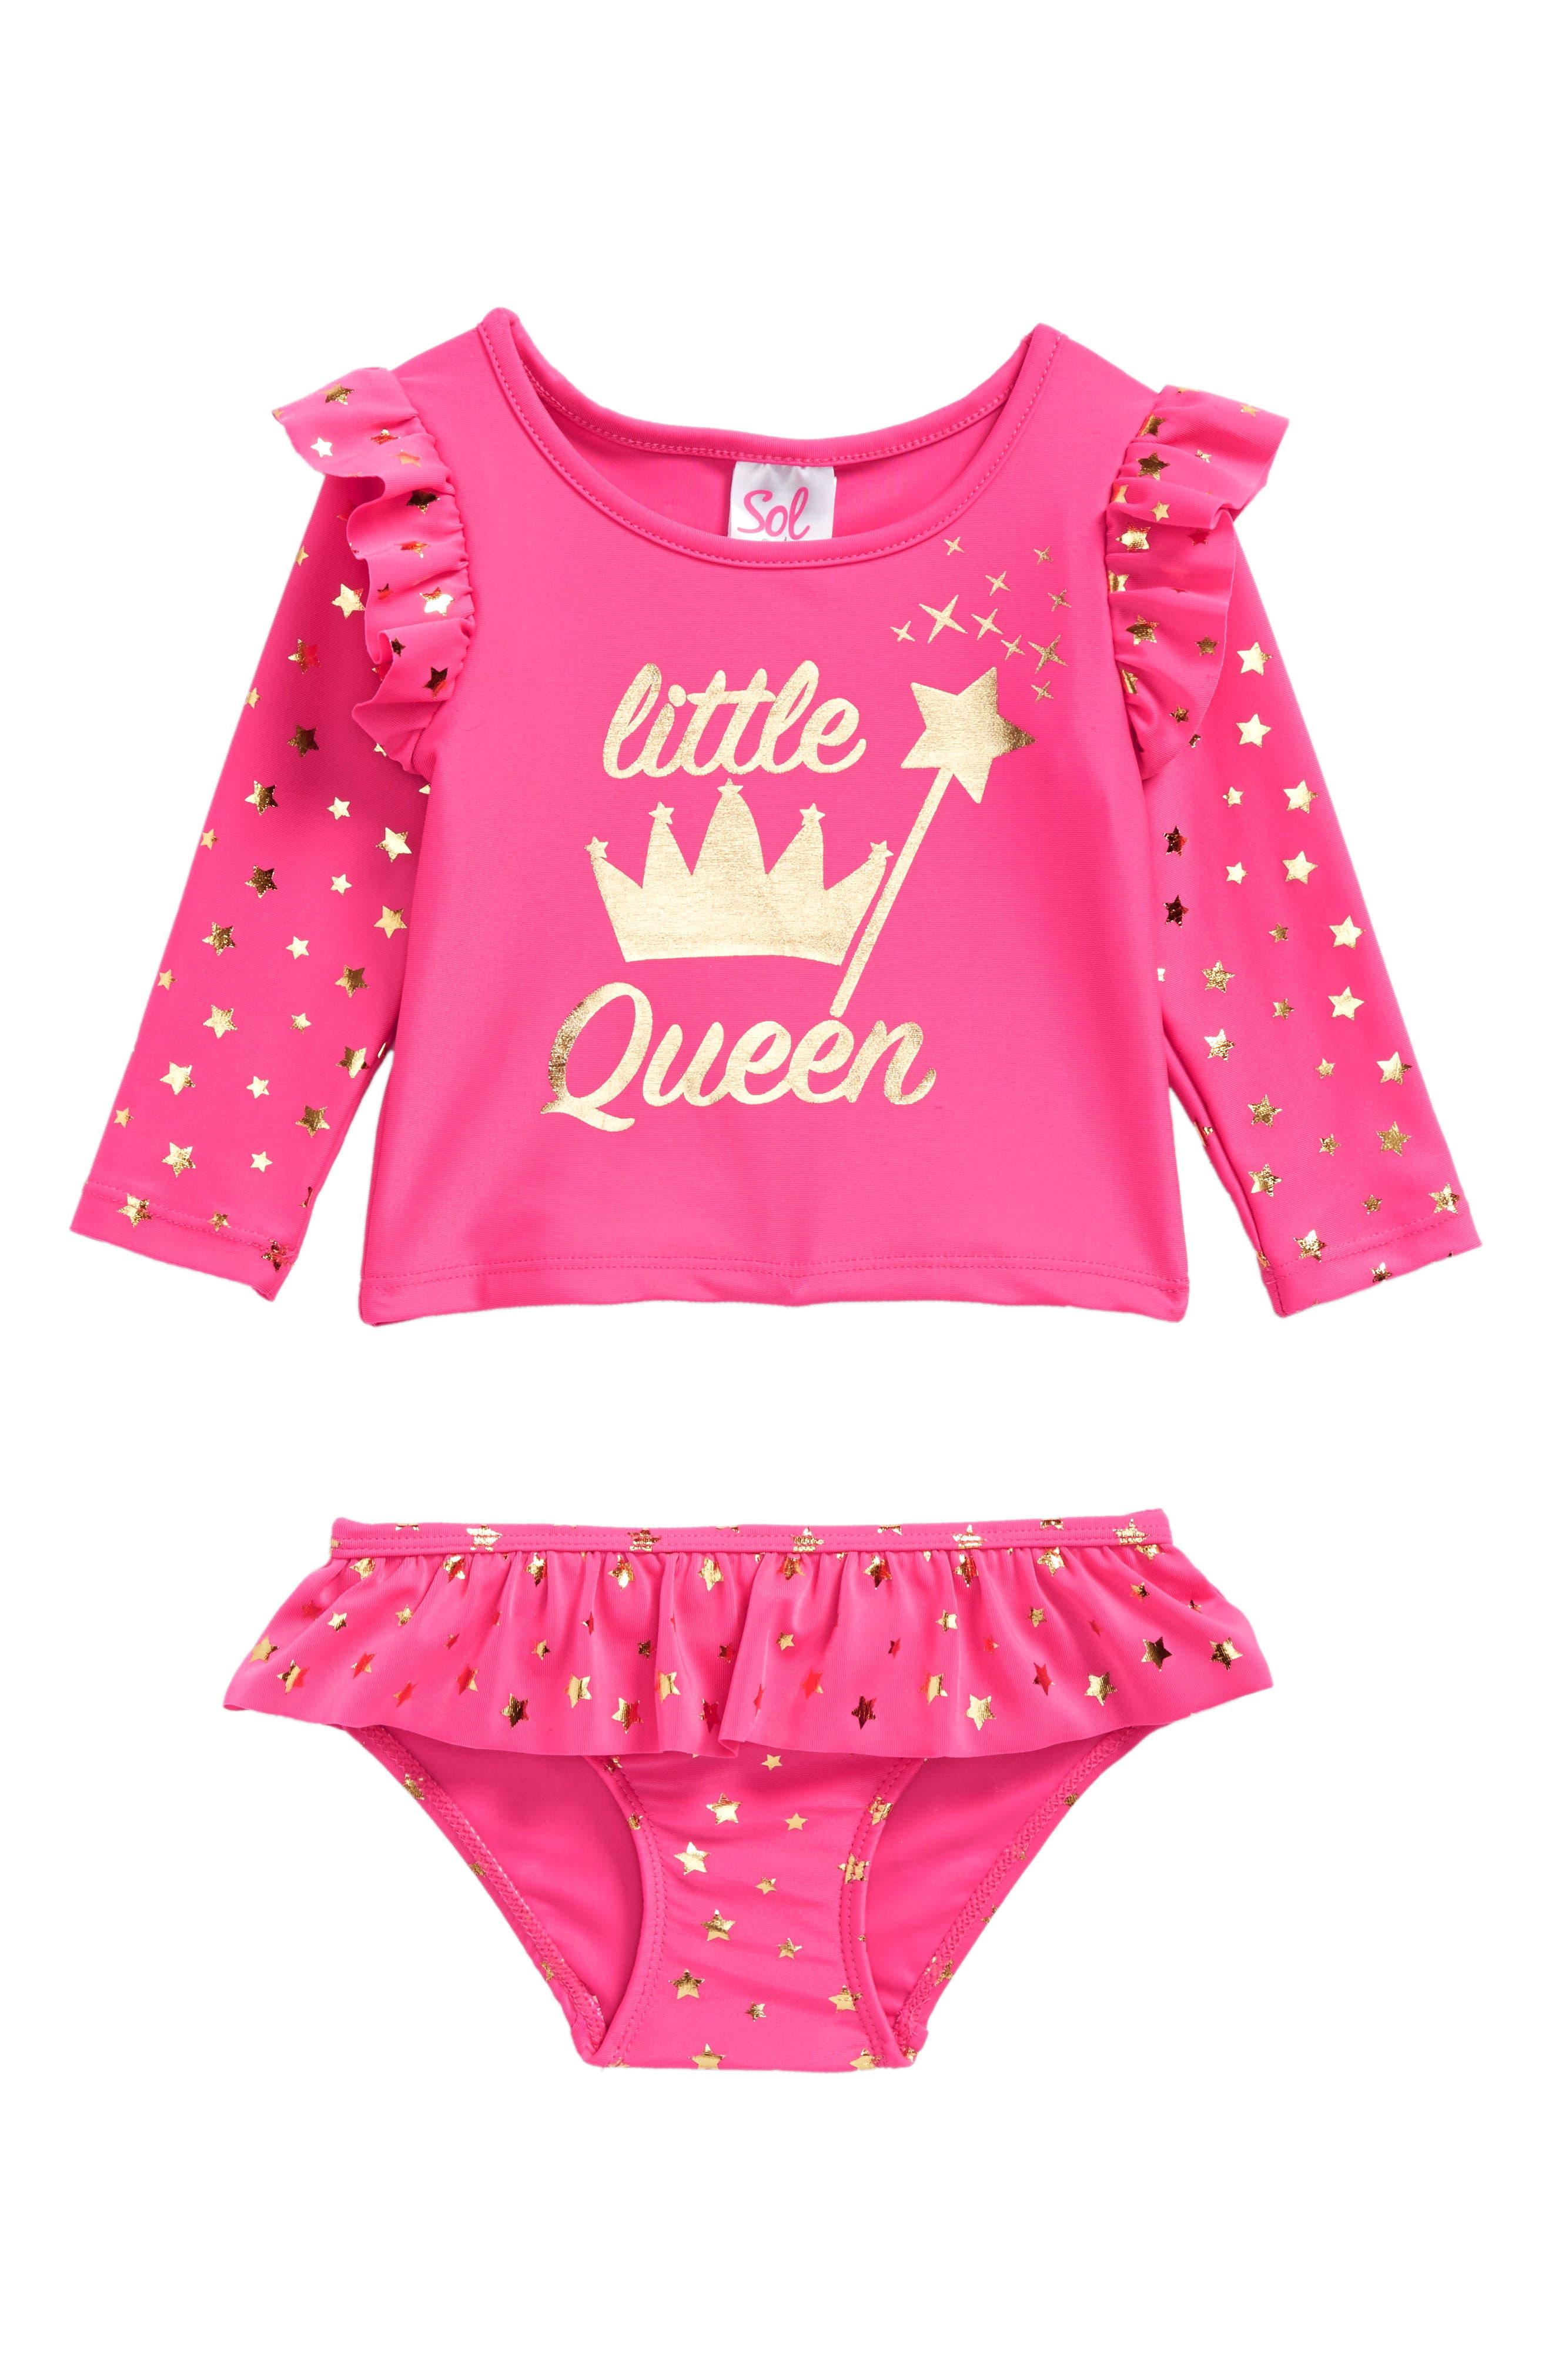 Little Queen Two-Piece Rashguard Swimsuit,                         Main,                         color, 670